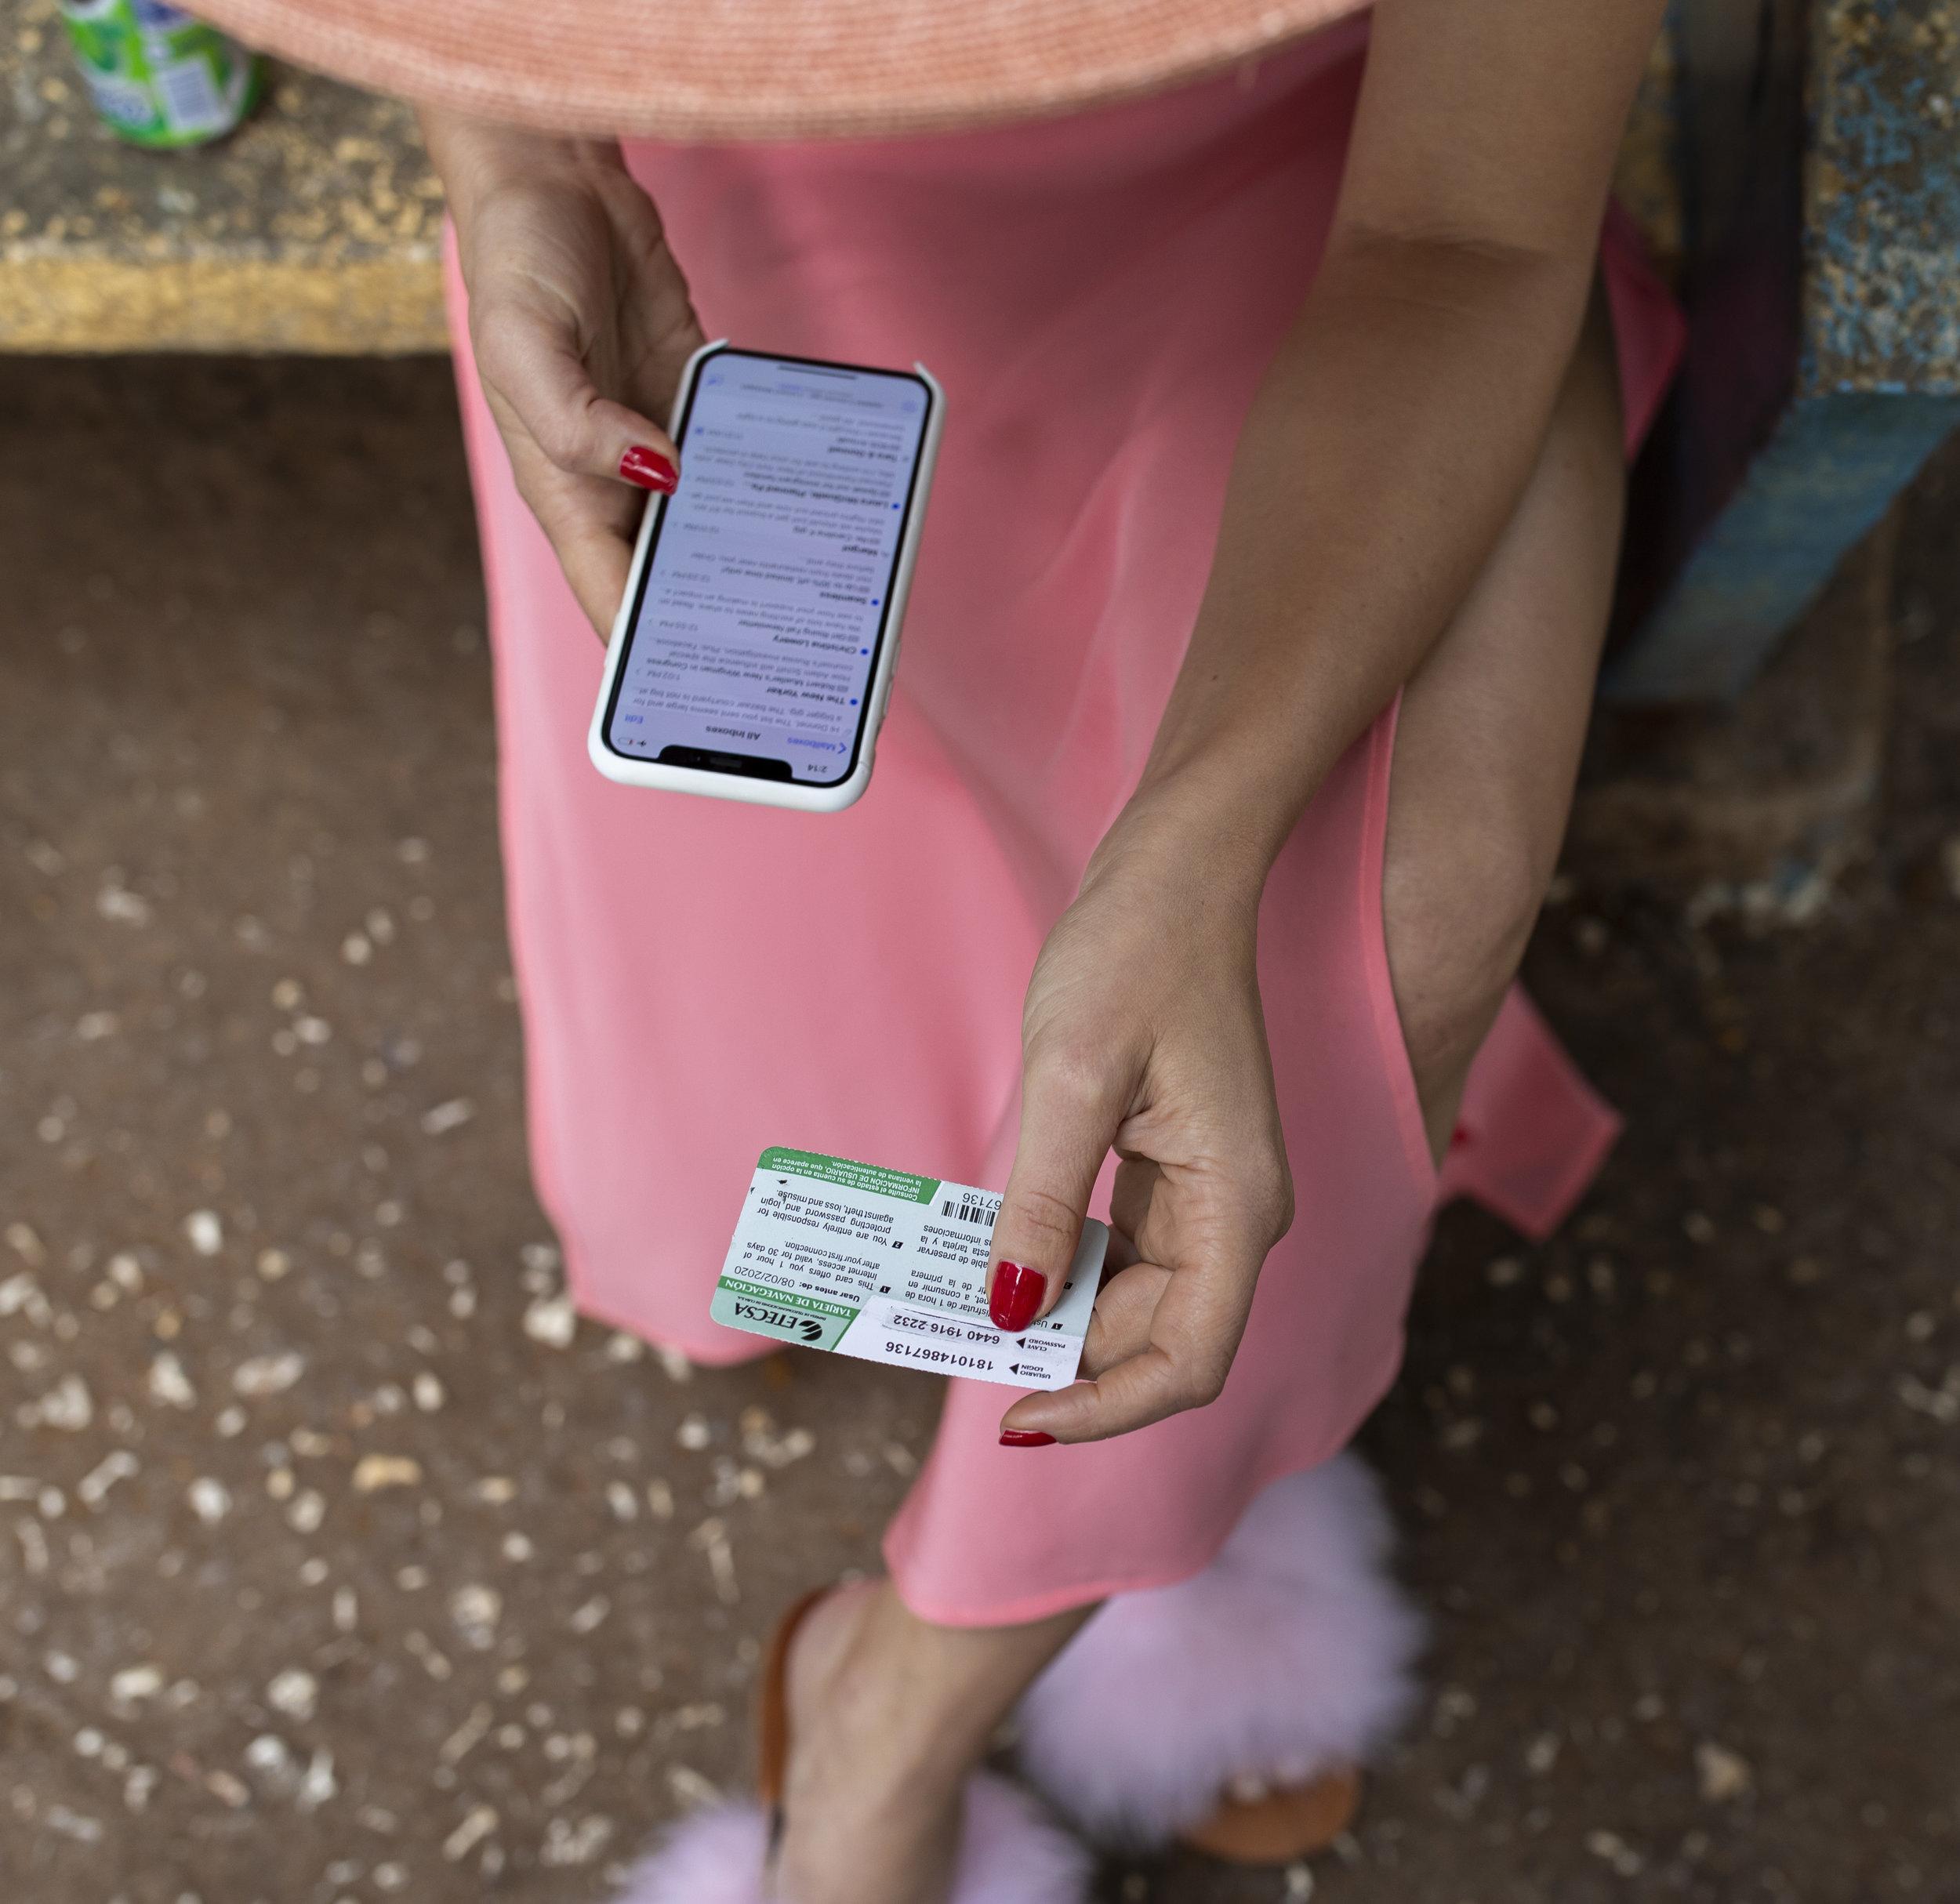 Need wifi? - Head to a public park!